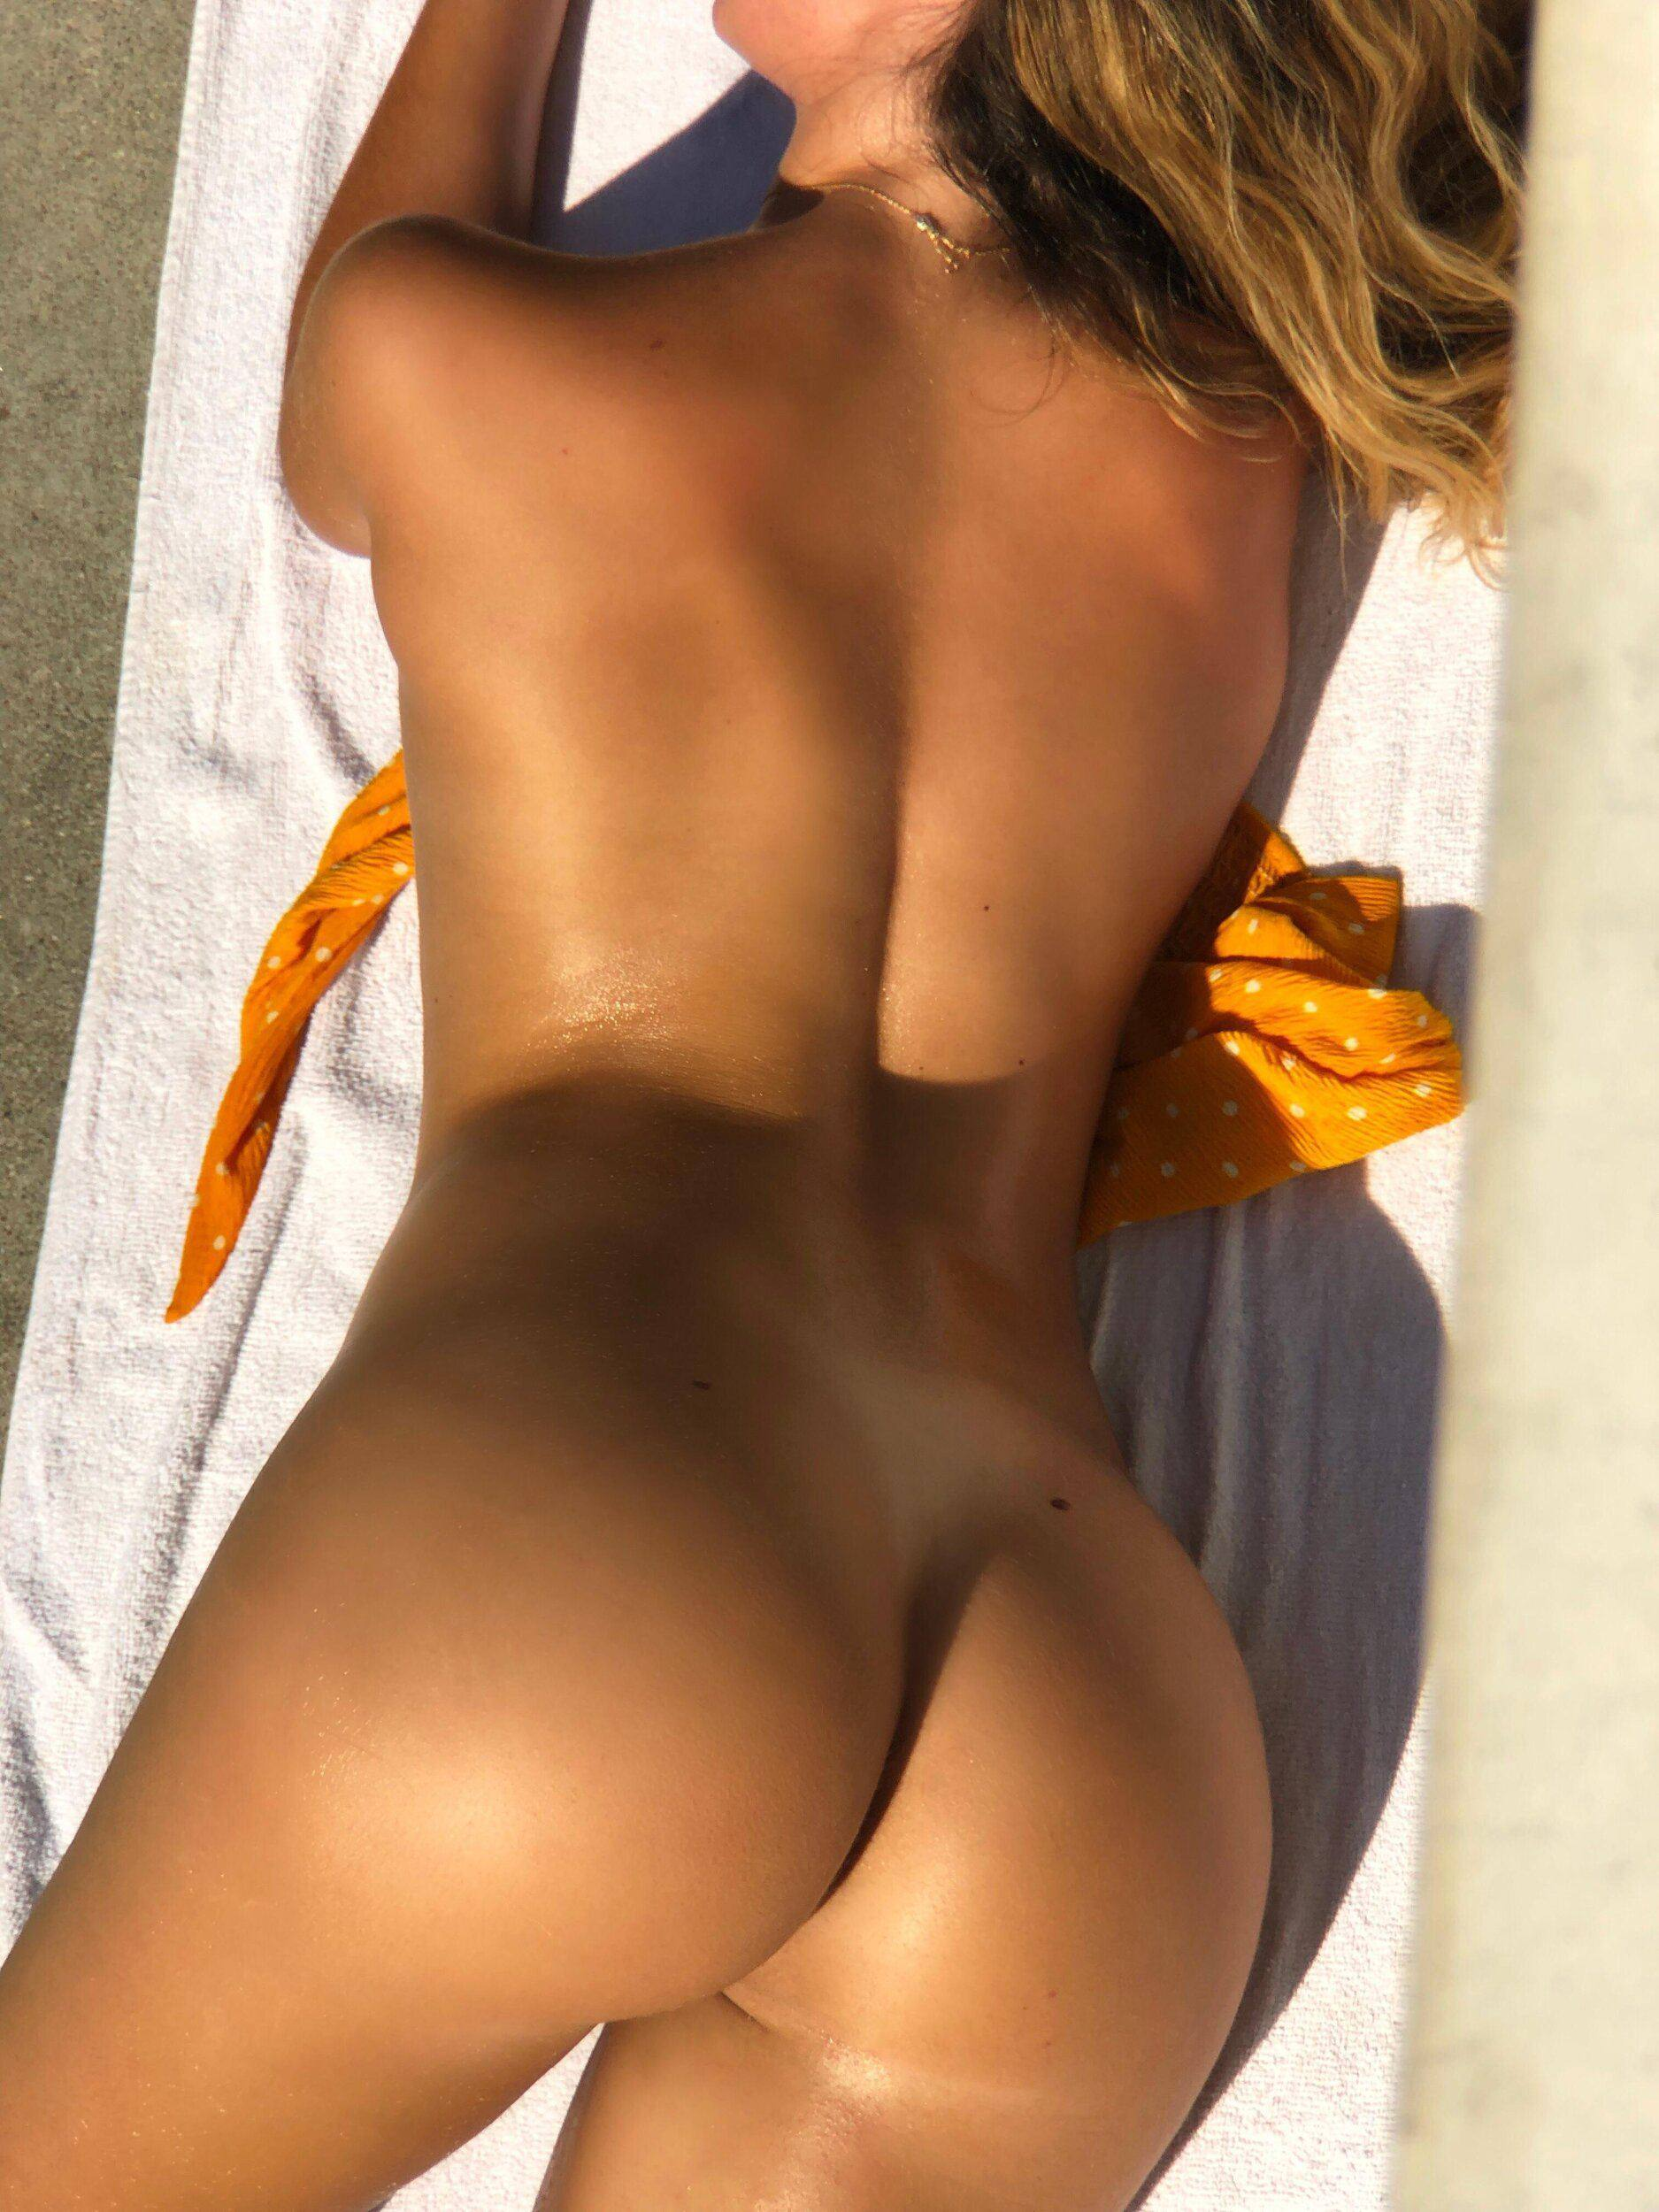 Rihanna Sexy In Fenty Beauty Cream Blush & Bronzer Photoshoot 0006